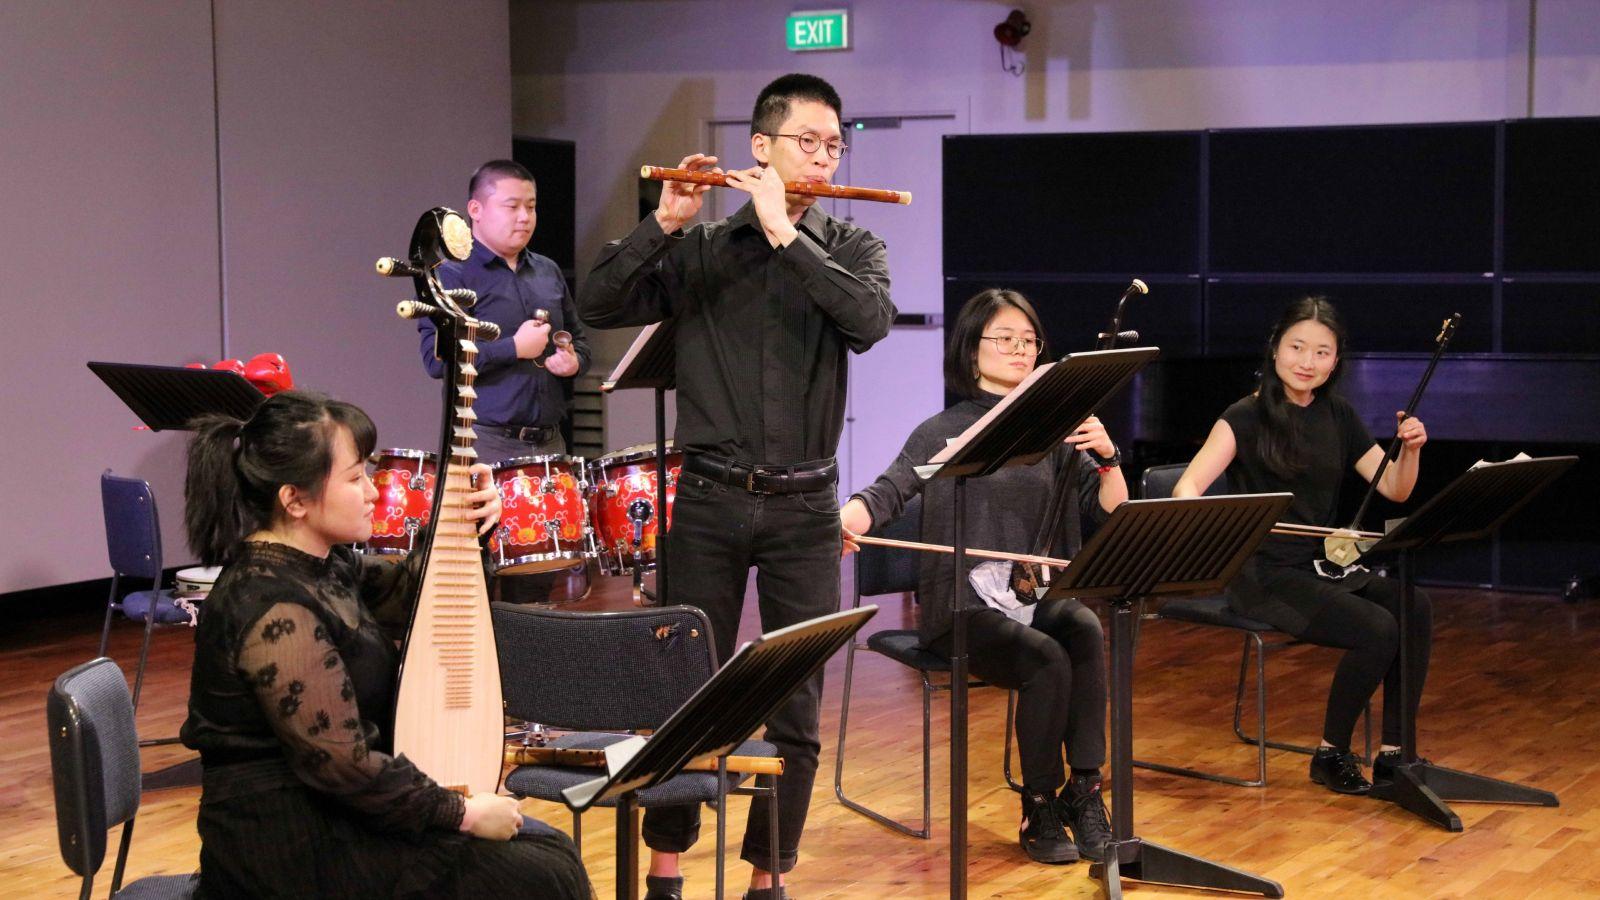 Ensemble leader Bo Yang on percussion with students Zoe Li and Xiaotong Yang on erhu, Xiuyu Li on  pipa, Zhong Gui on piano and Jeff Lin on dizi (flute)